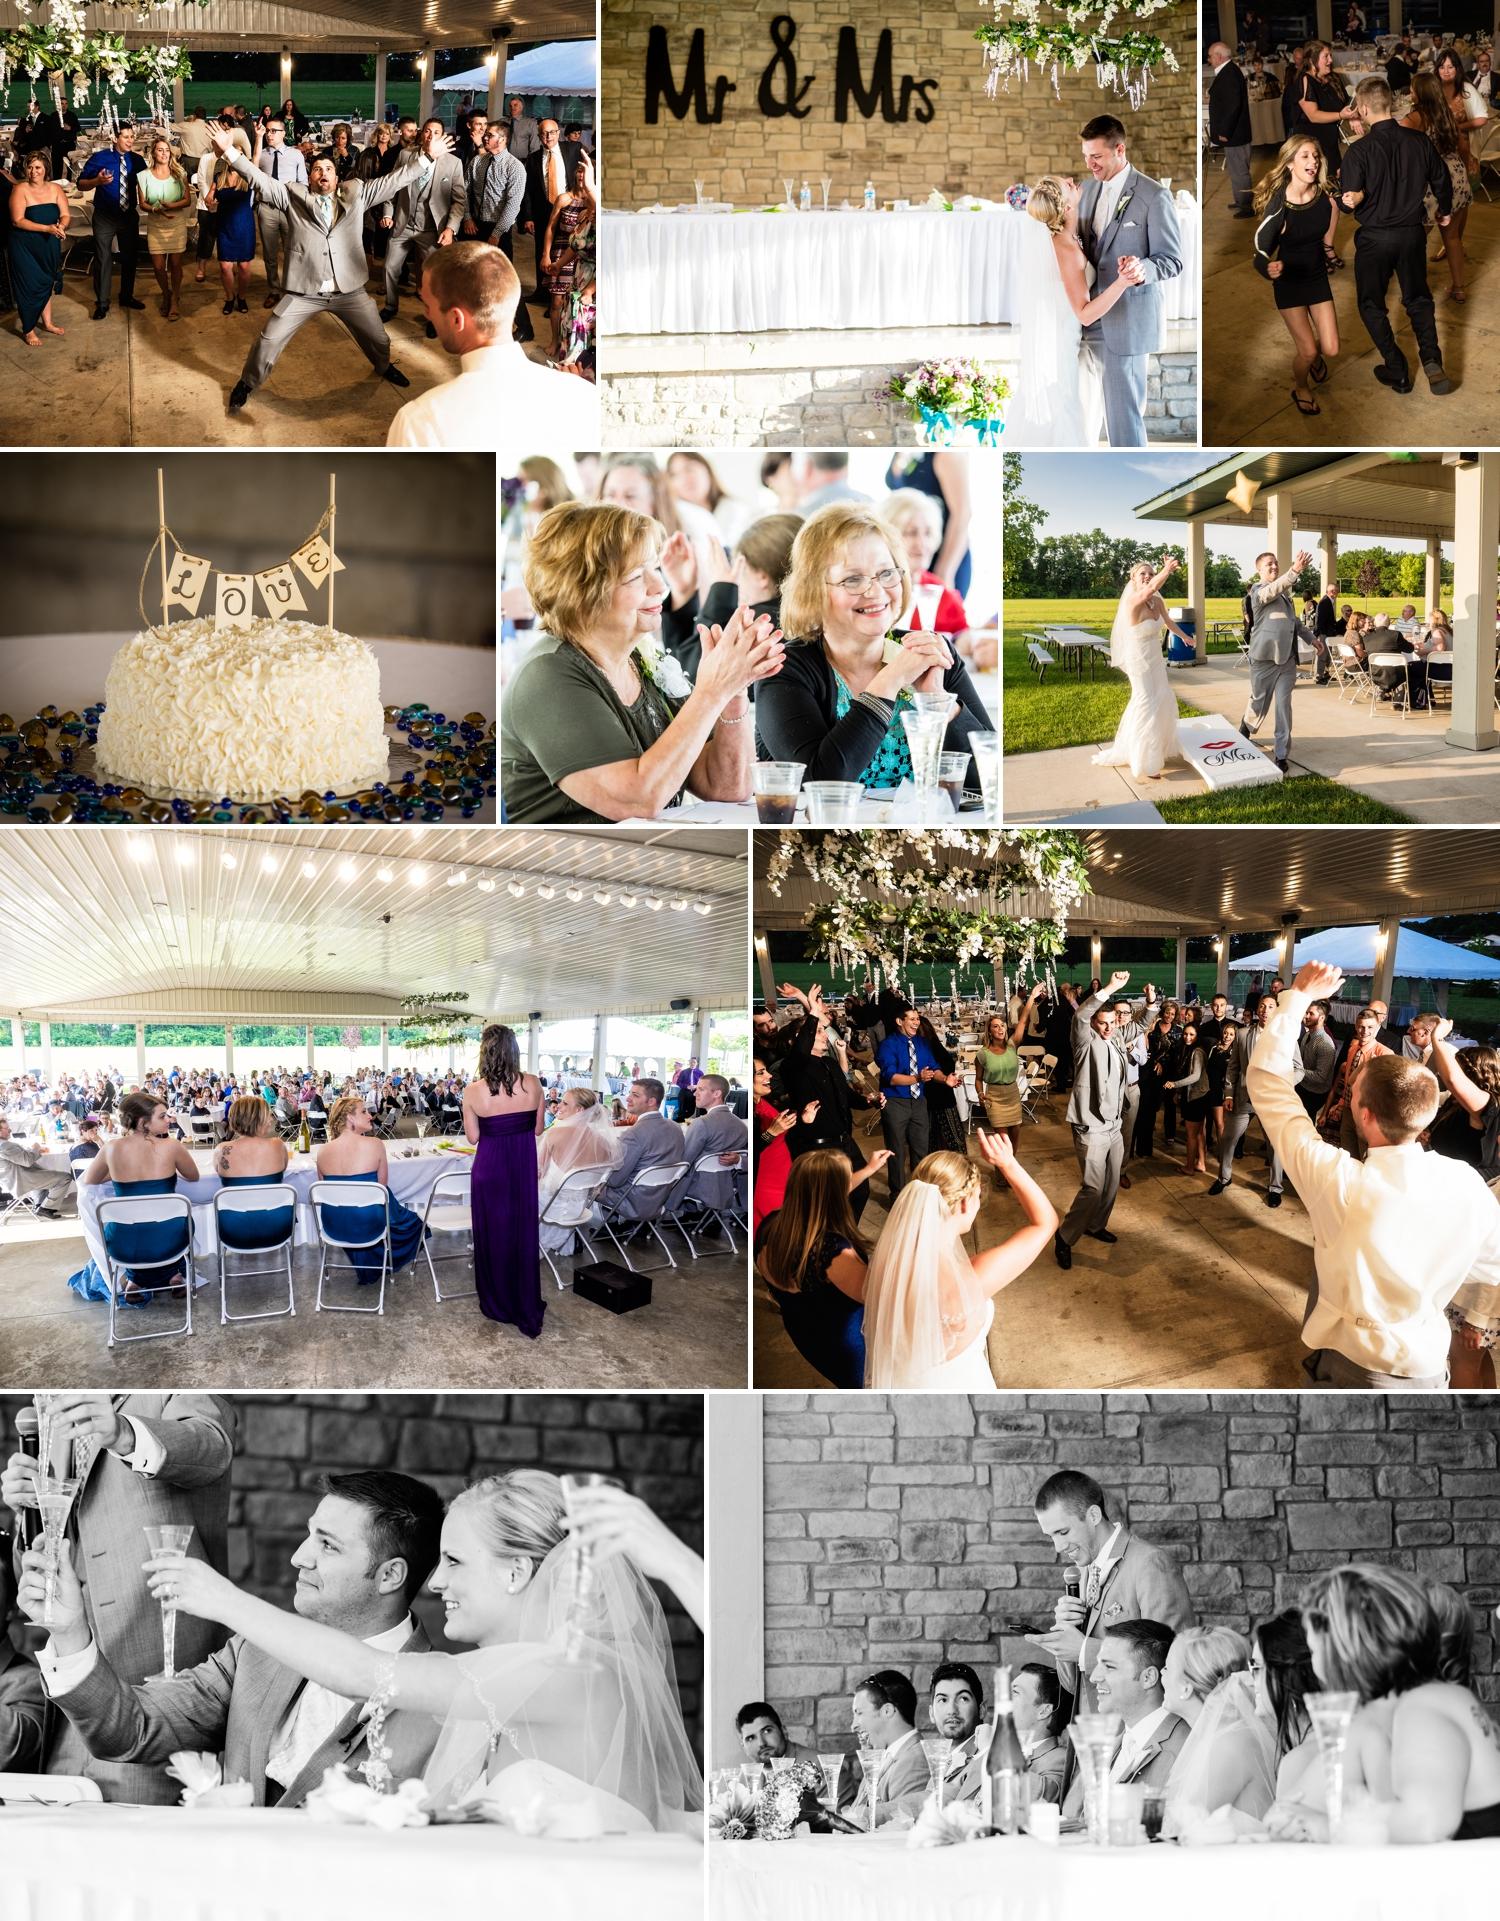 Wedding reception at the YMCA Pavilion in Valparaiso, Indiana.